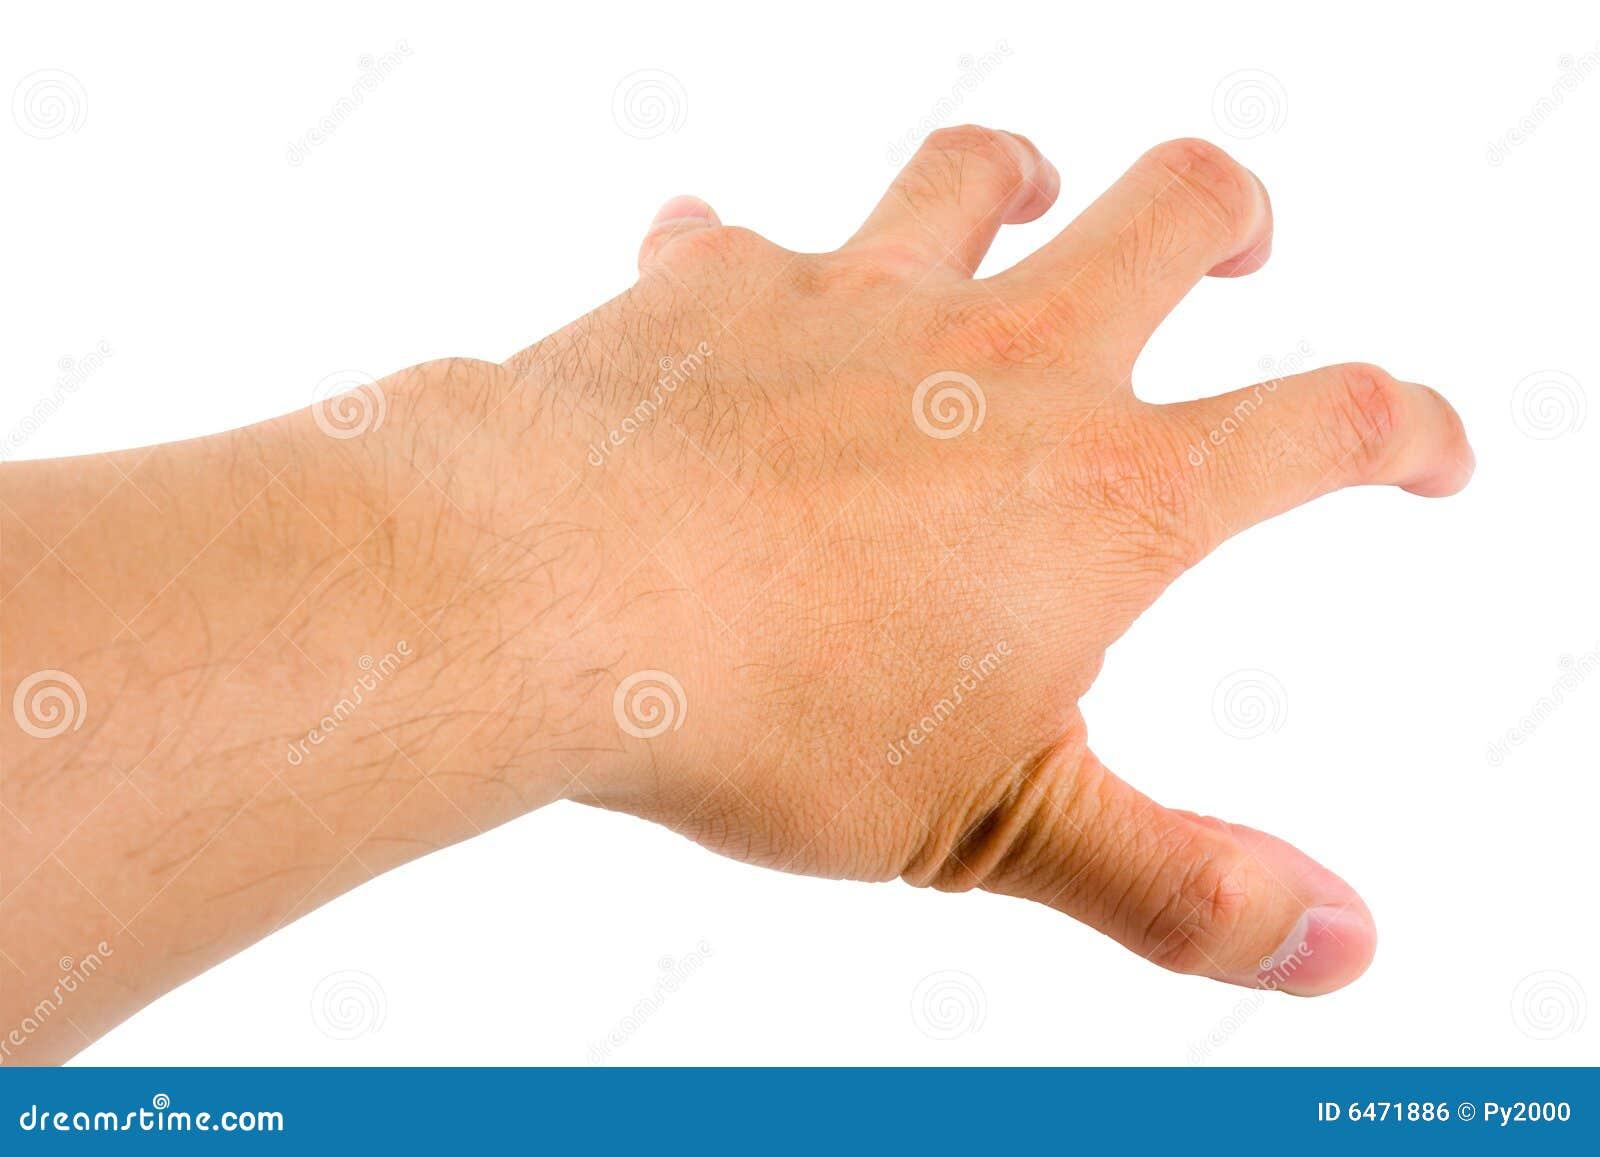 grabbing hand stock photo image of grasp body fingers 6471886